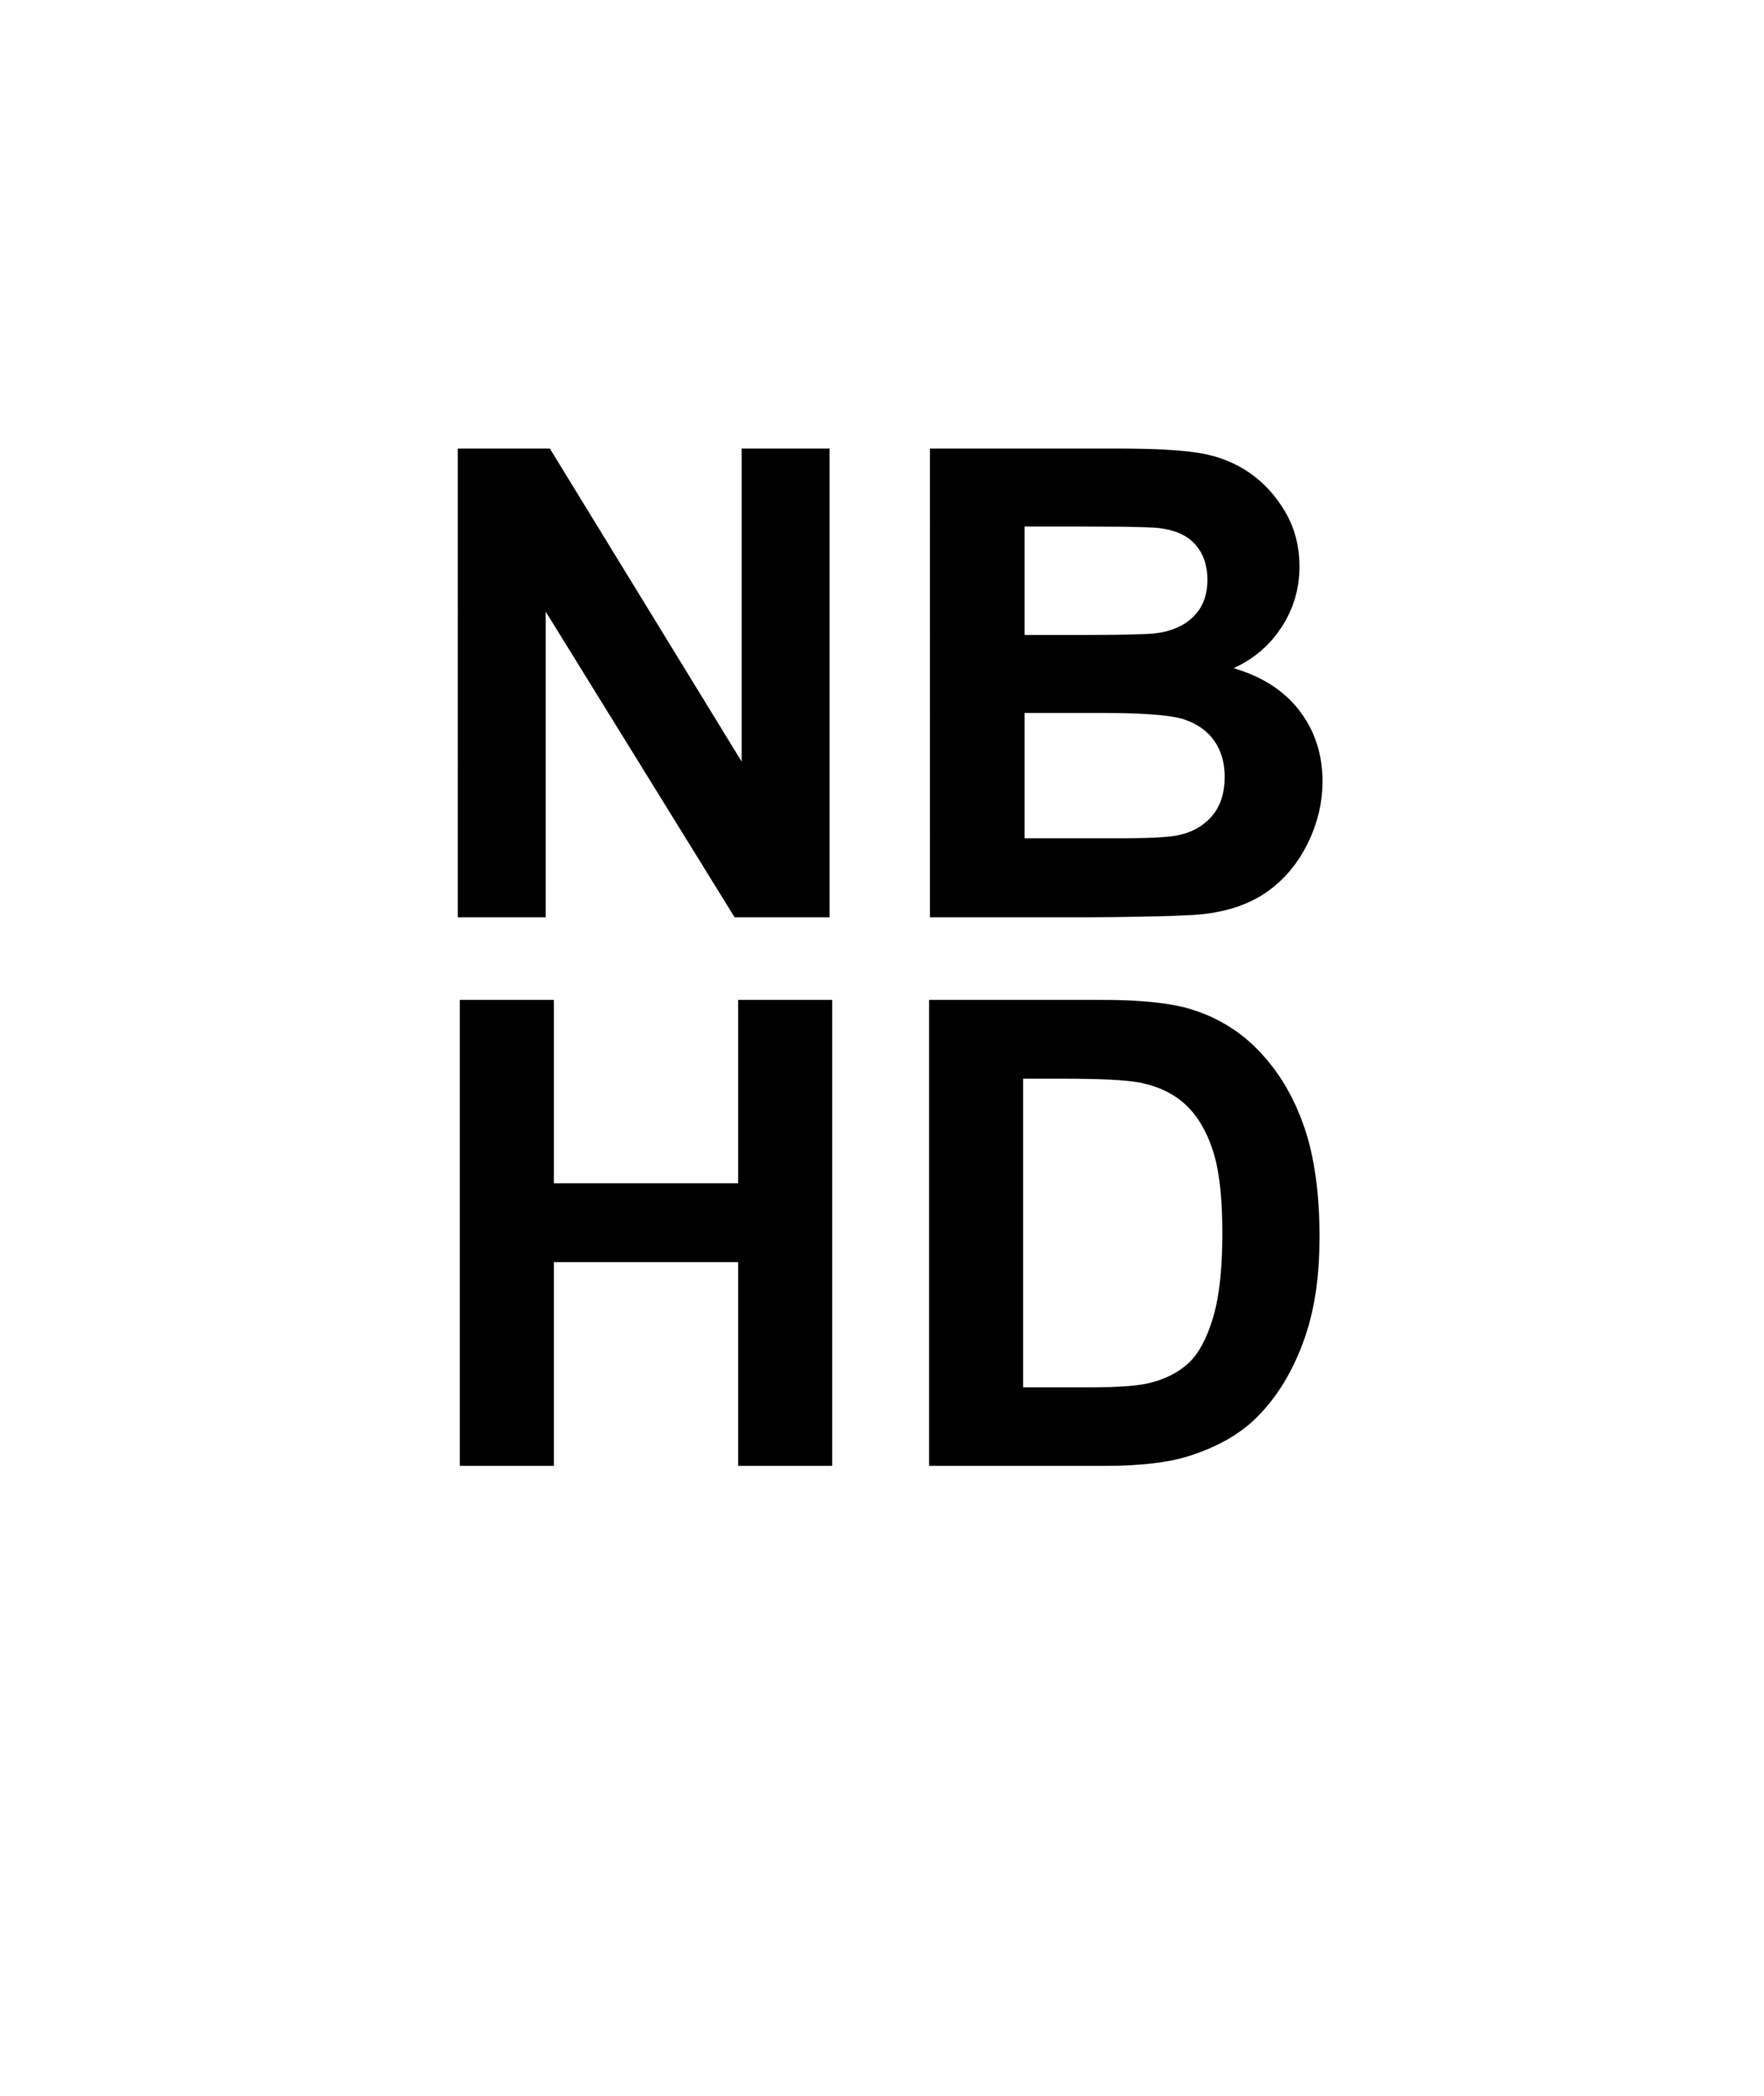 NB-logo-black.png